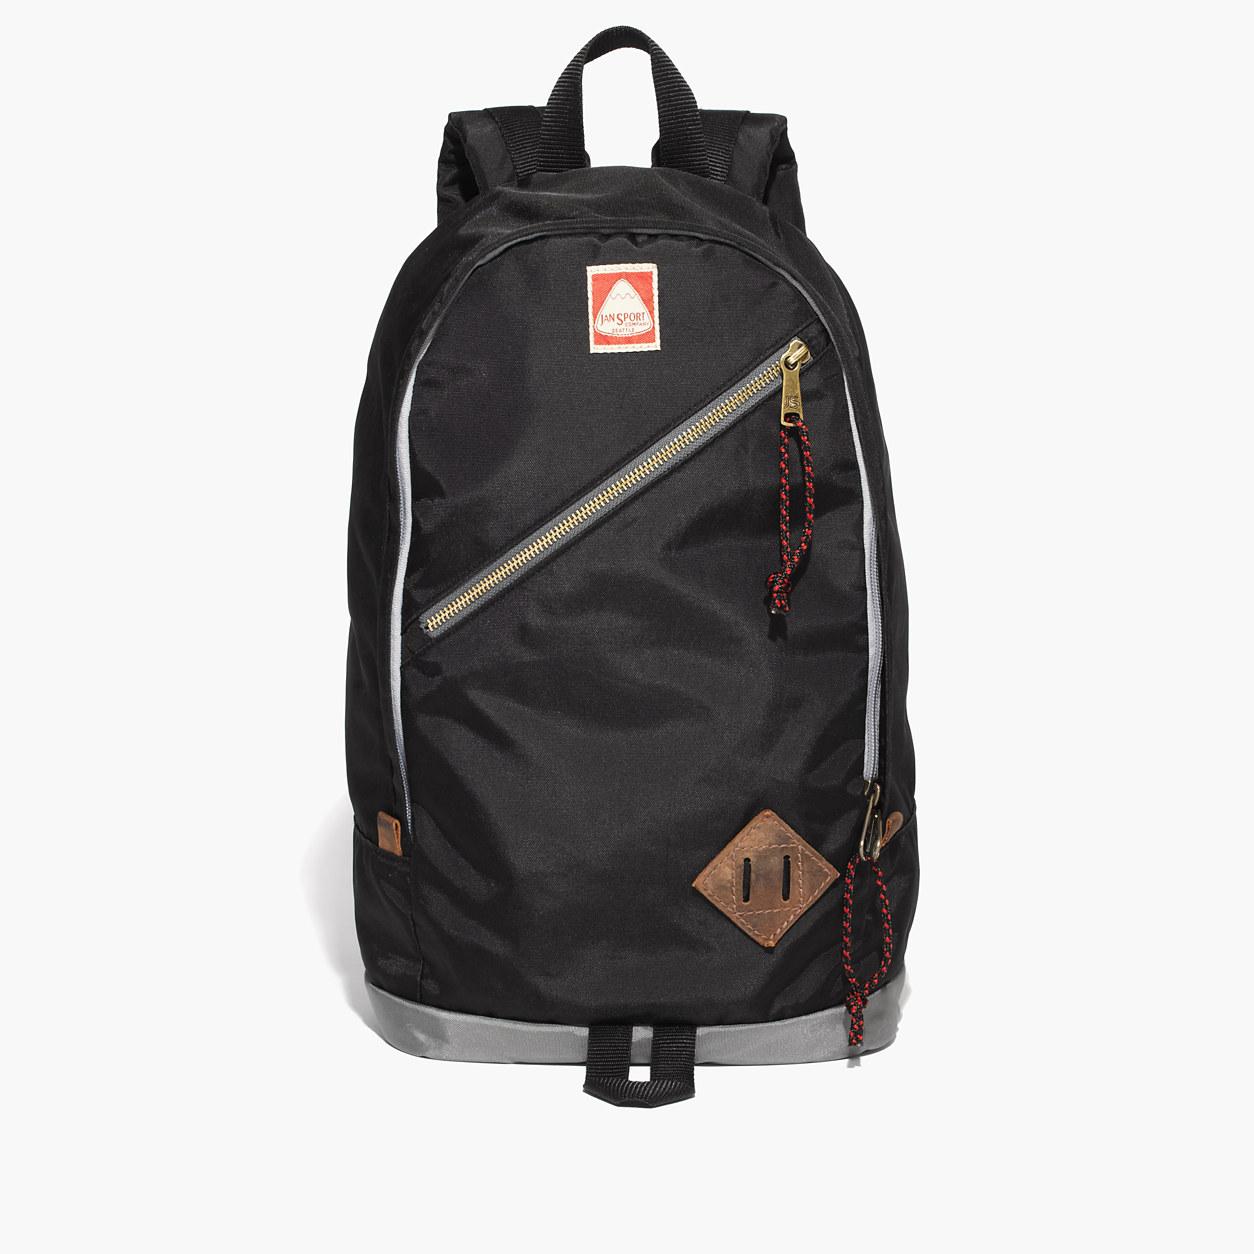 JanSport® & Madewell Compadre Backpack : backpacks | Madewell